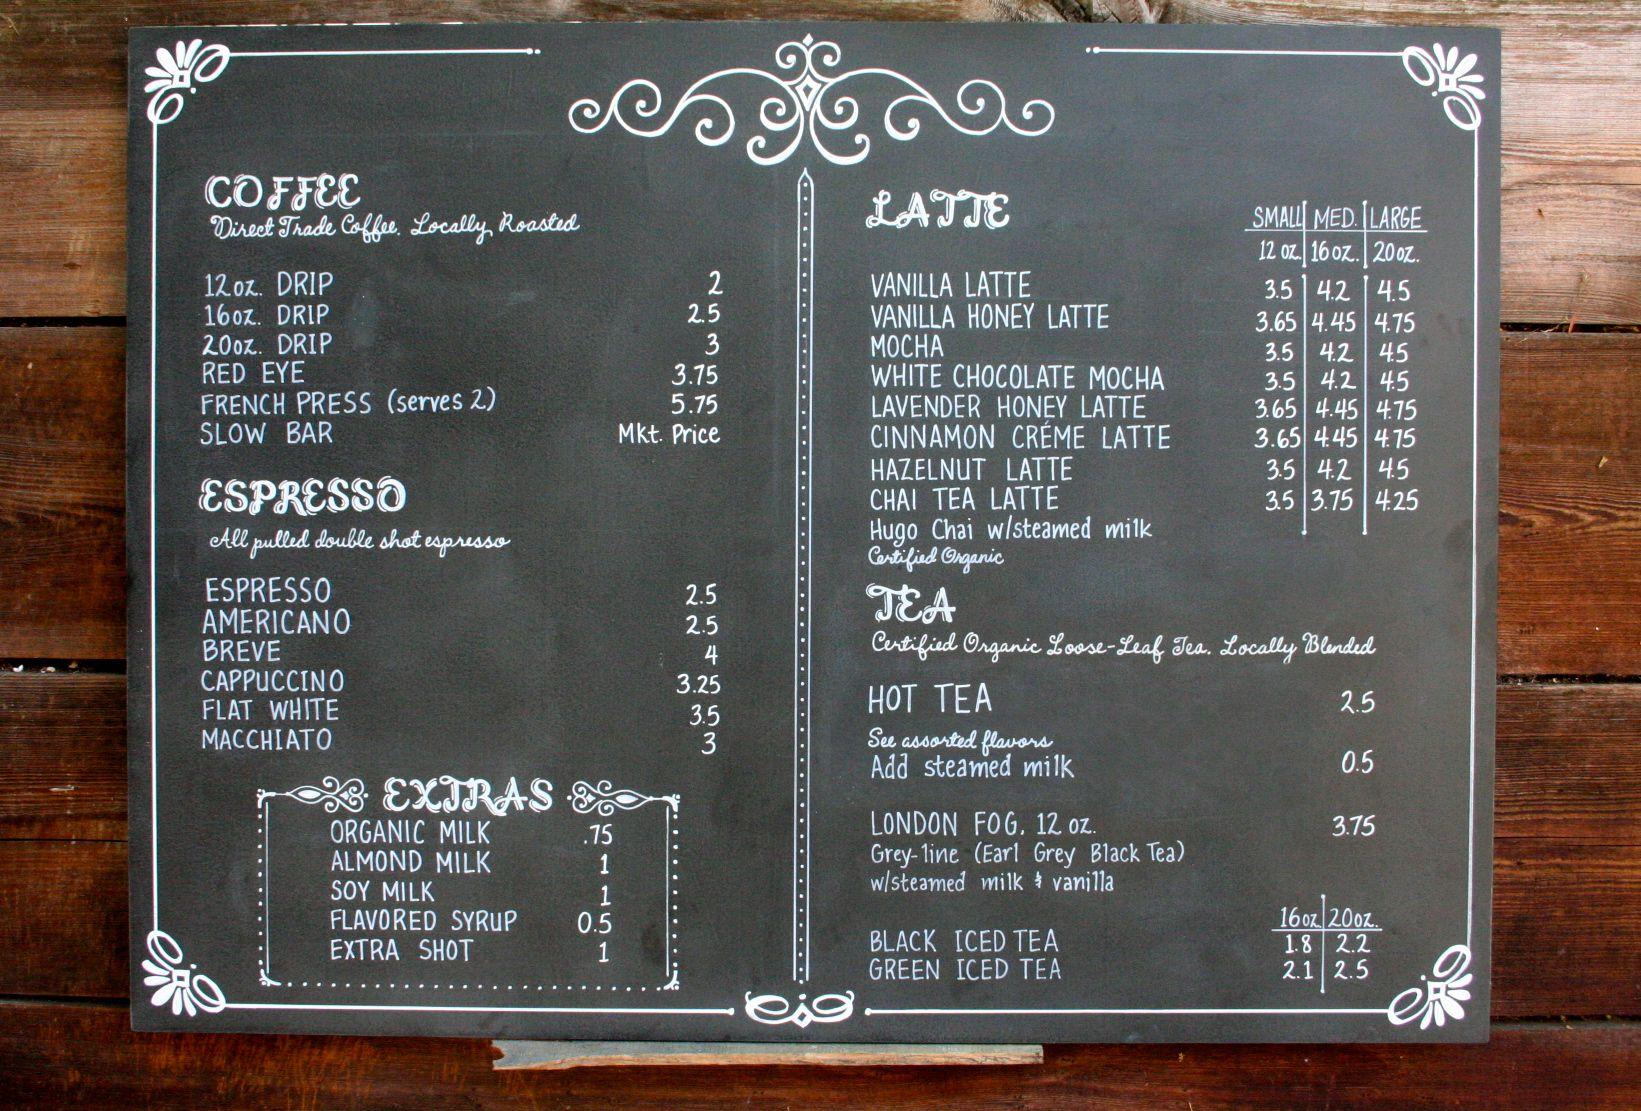 Chalkboard coffee shop menu for POUR coffeehouse in Kansas